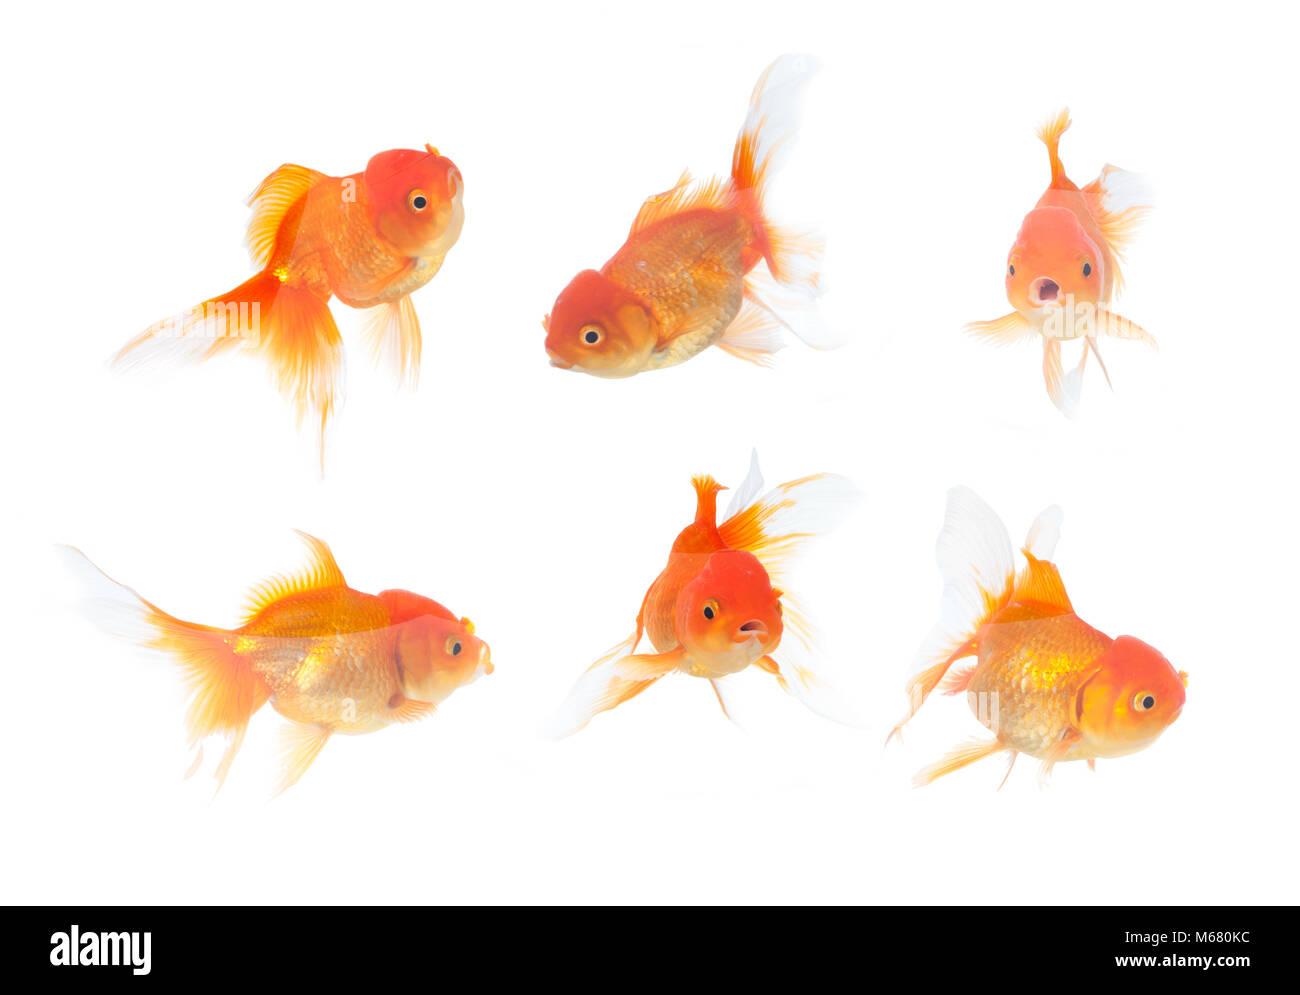 Many gold fish on the white background Stock Photo